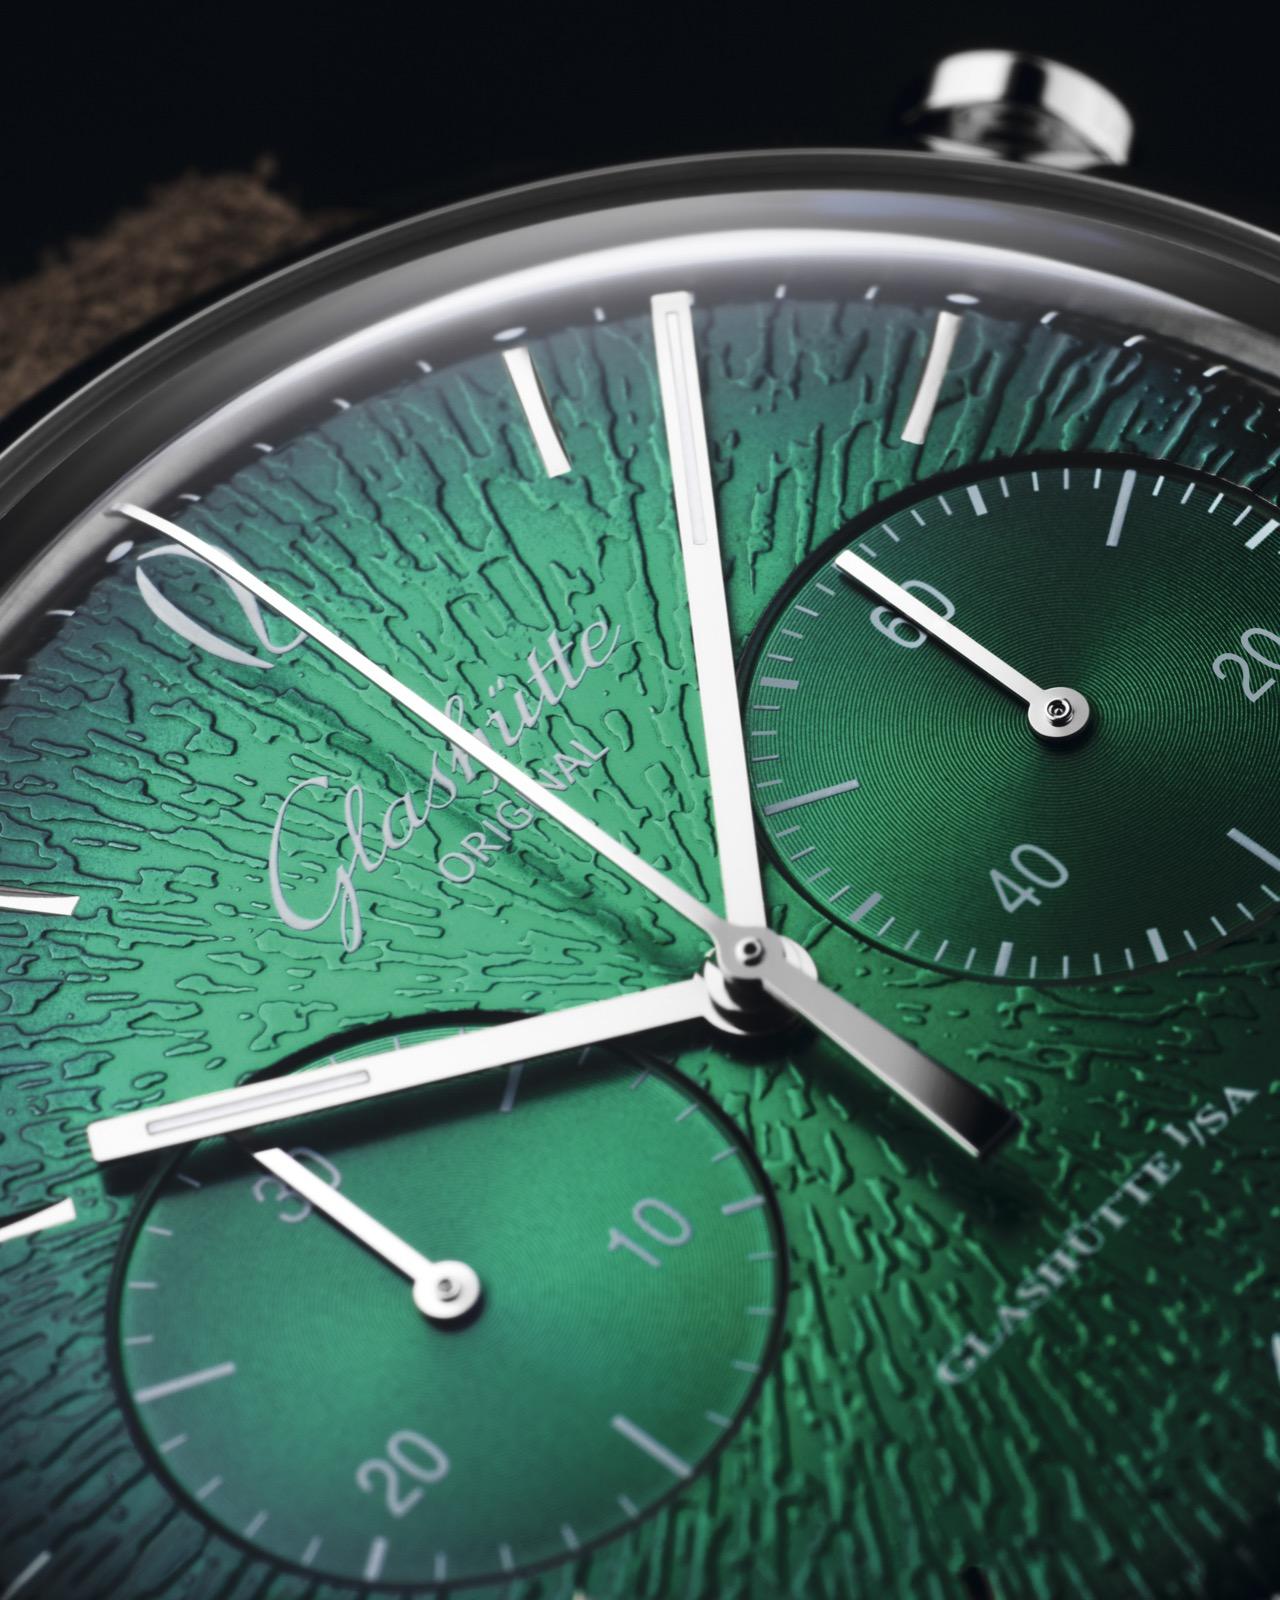 Glashütte Original Sixties Chronograph Annual Edition